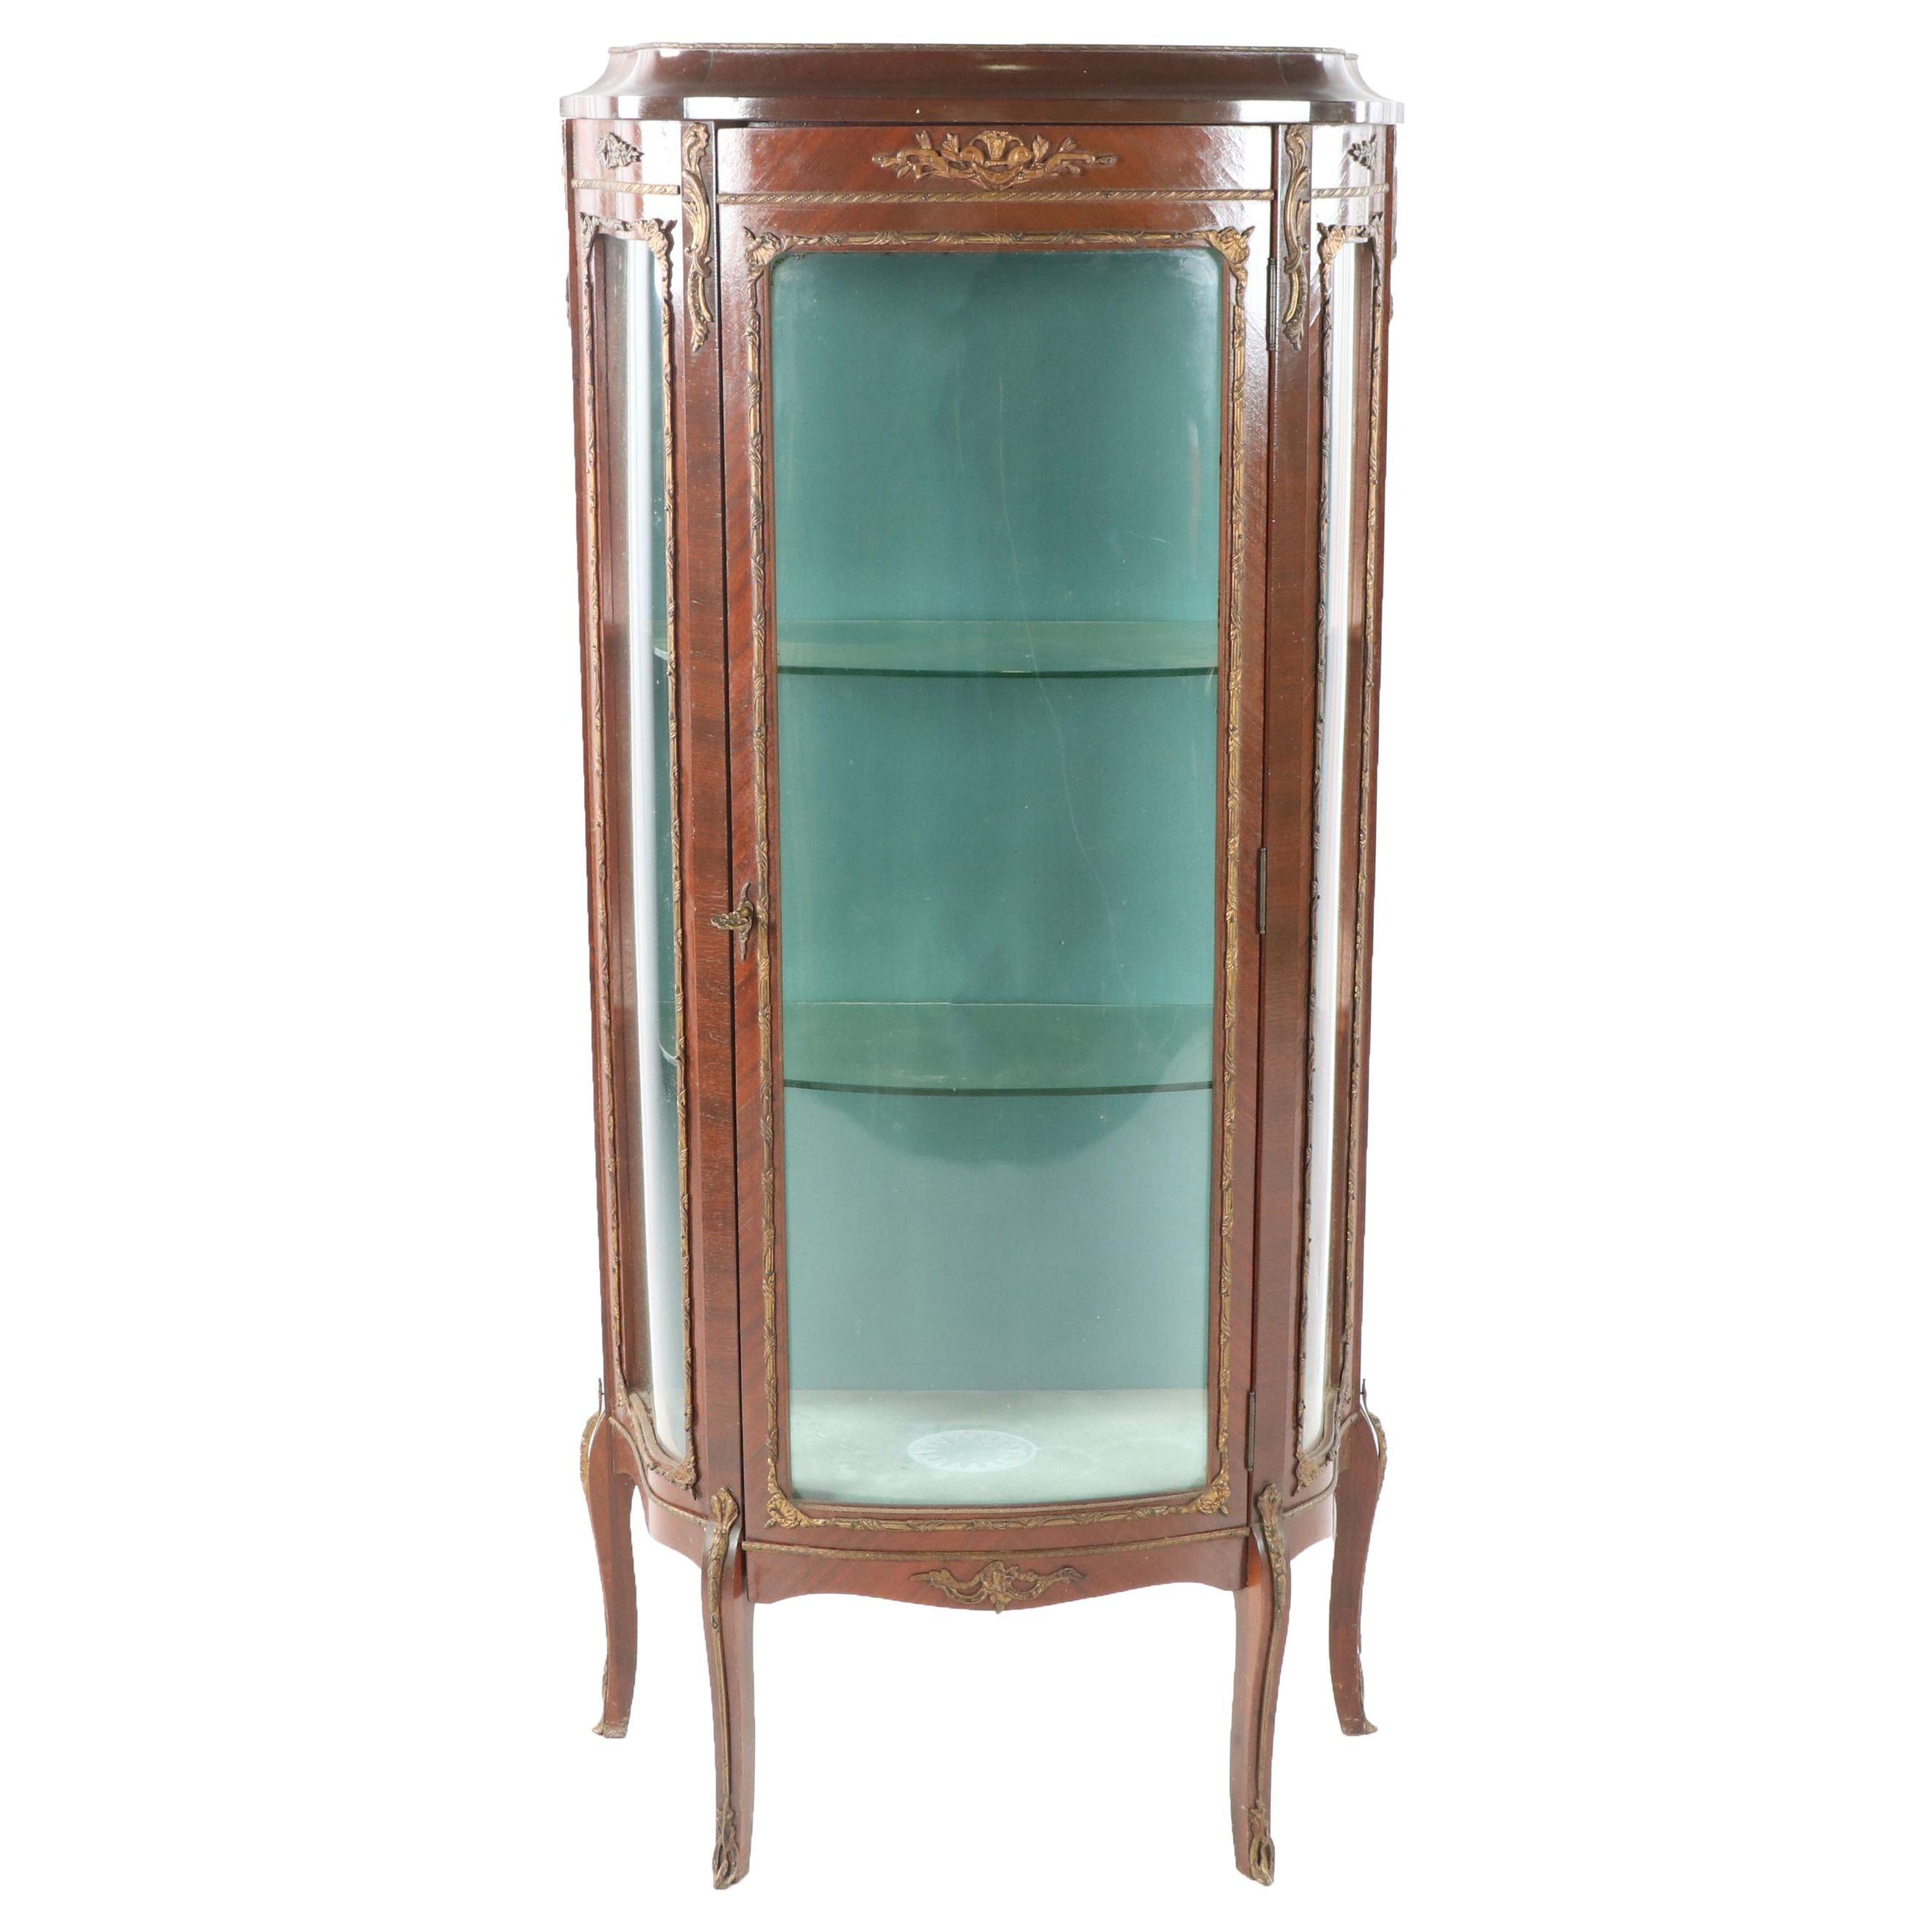 Louis XV Style Banded Mahogany Curio Cabinet, 20th Century